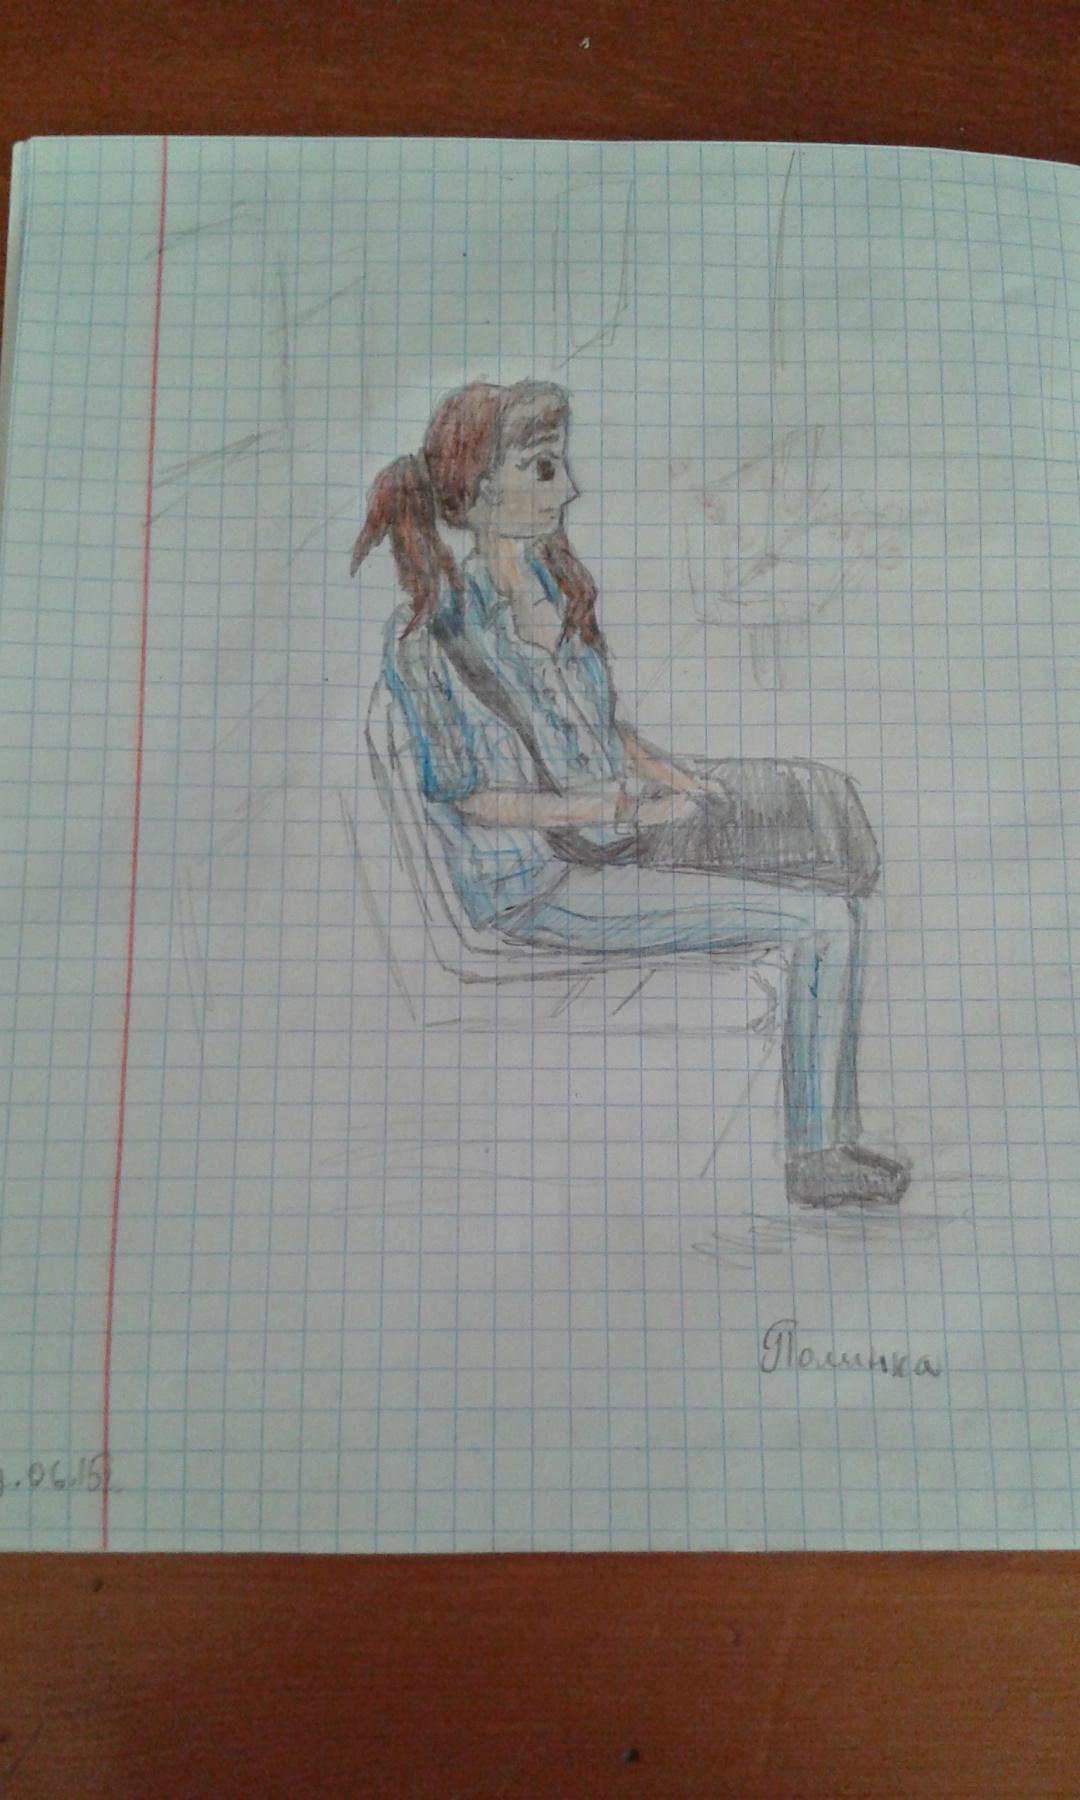 Zina Vladimirovna Parisva. Sketch